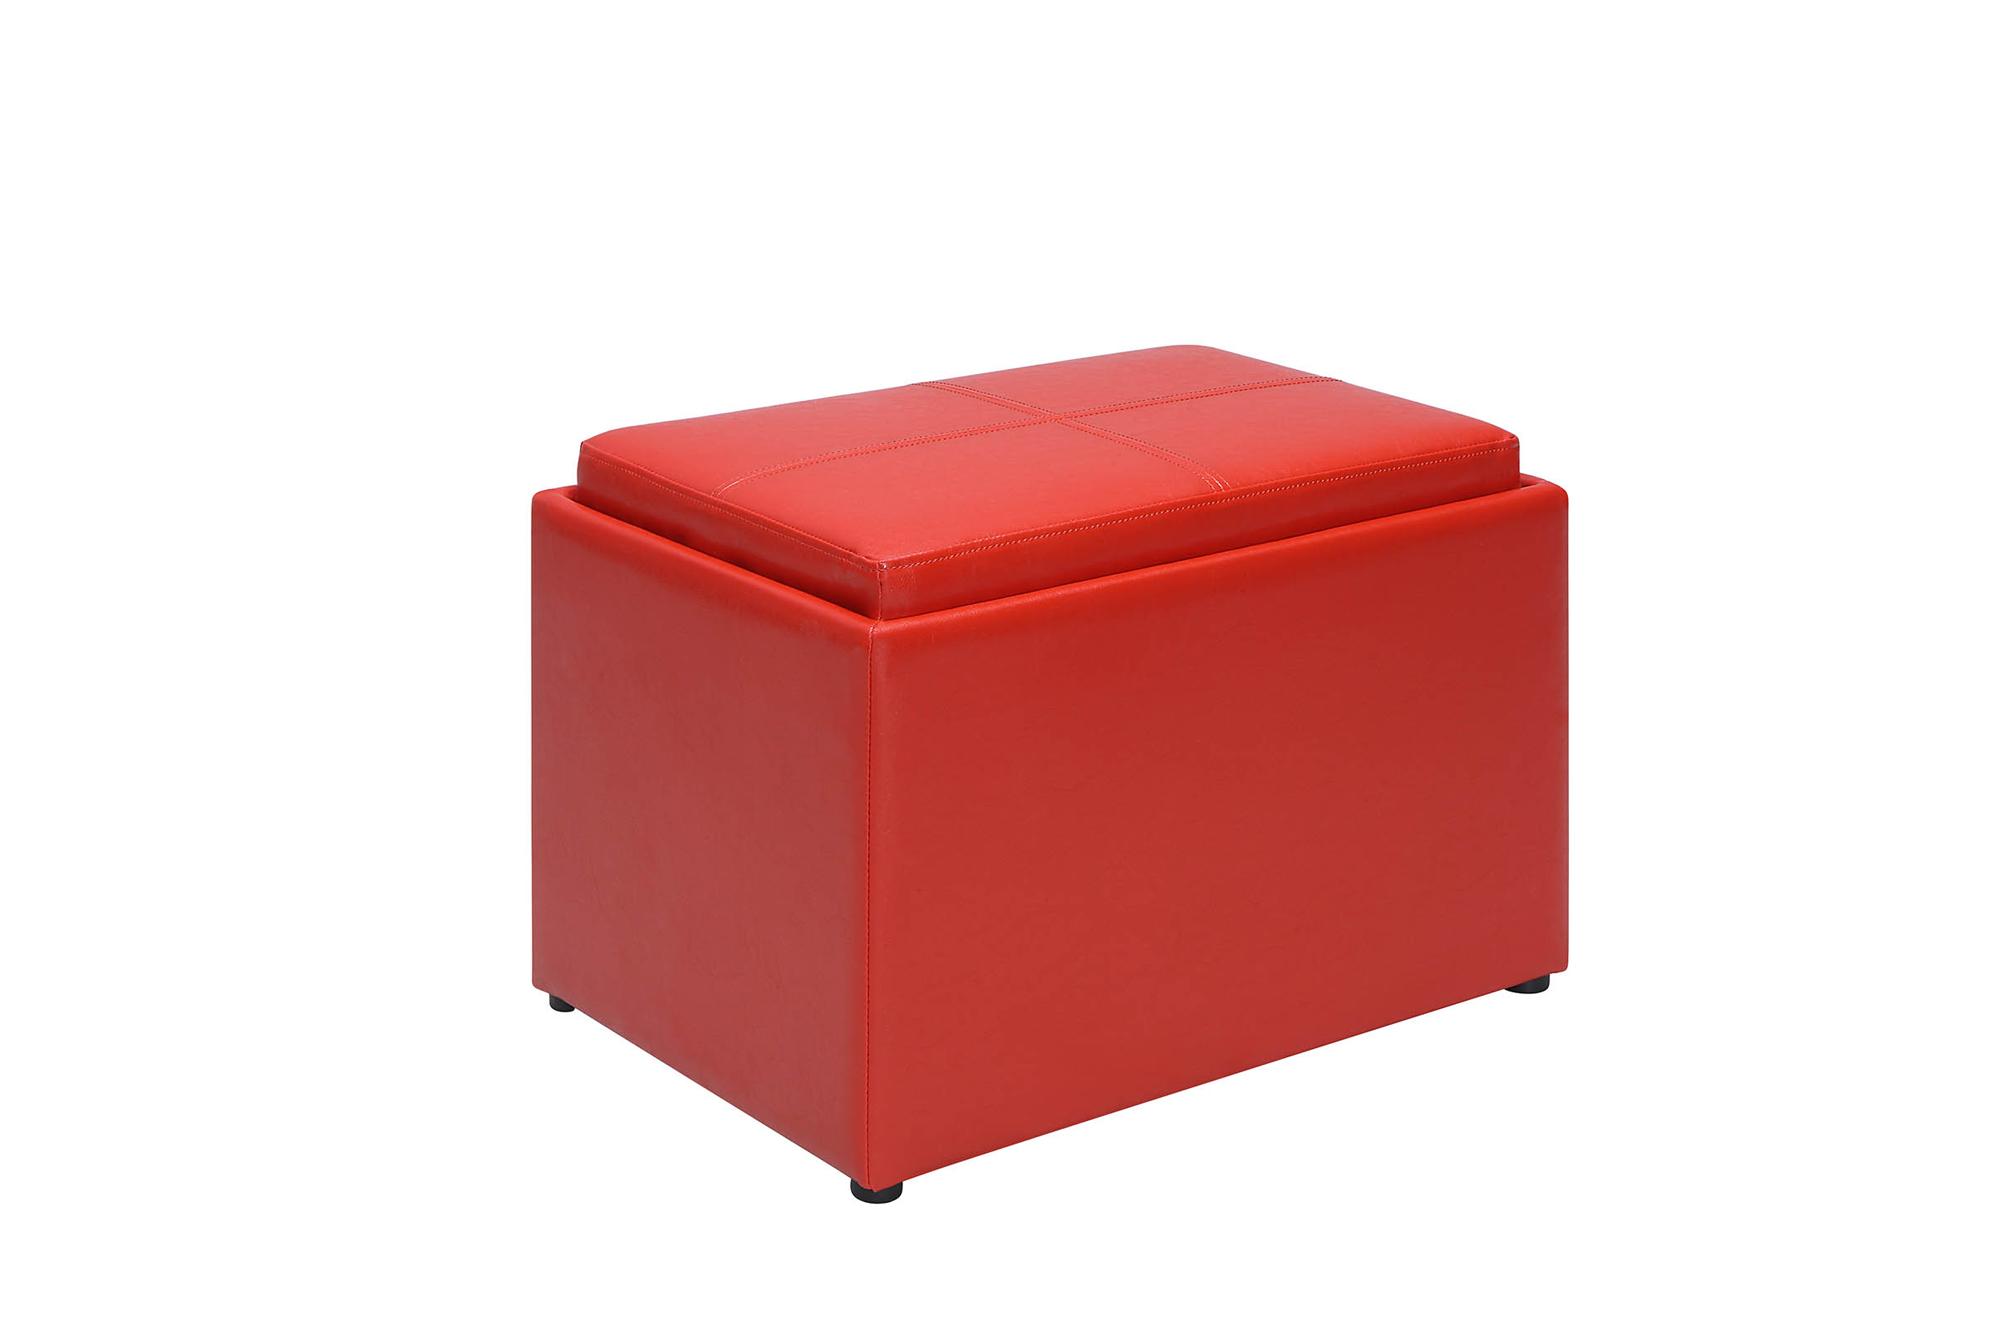 Convenience Concepts 143523RD Designs4Comfort Accent Storage Ottoman